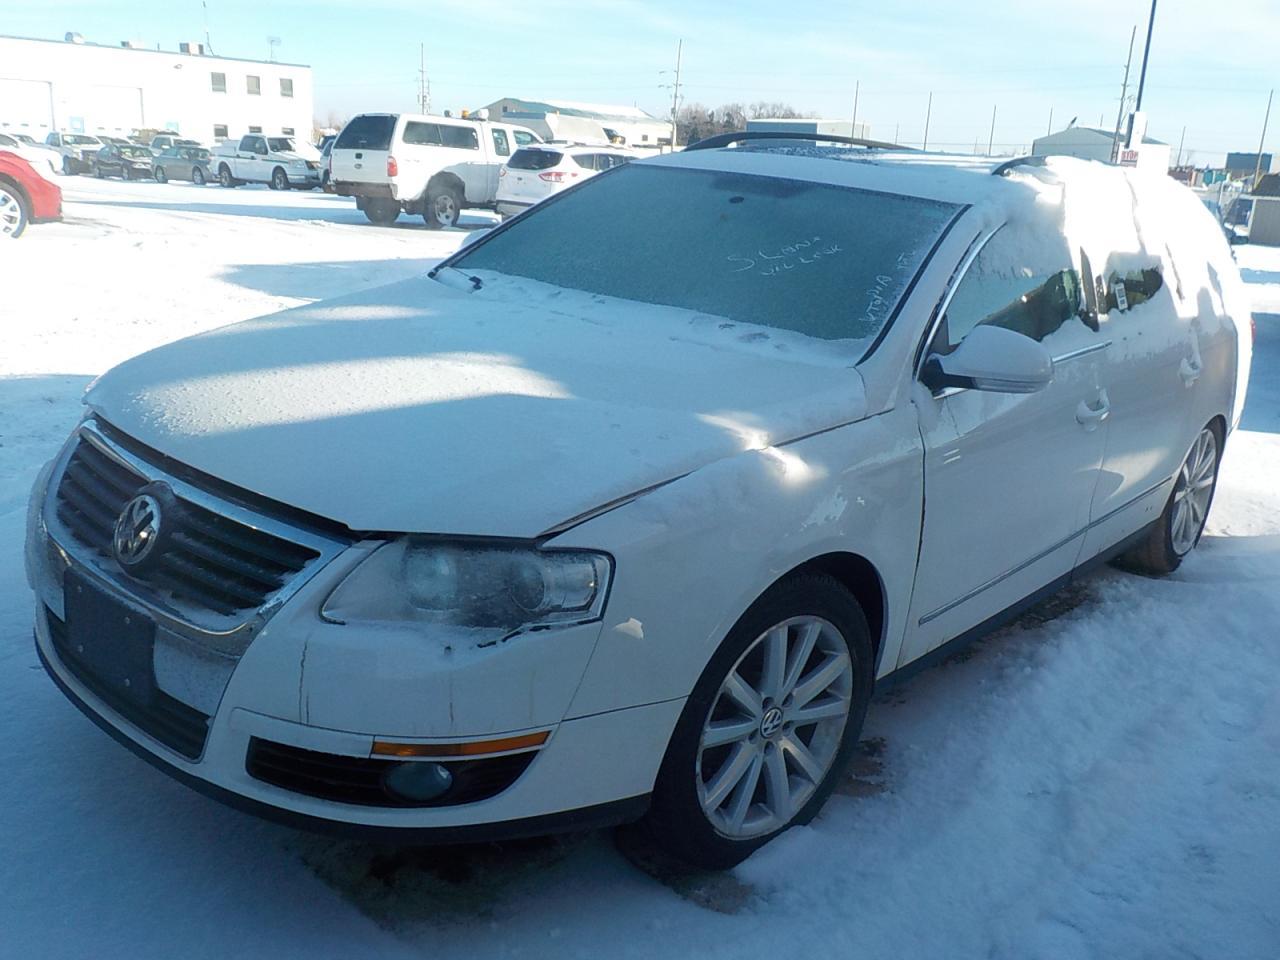 Photo of White 2008 Volkswagen Passat